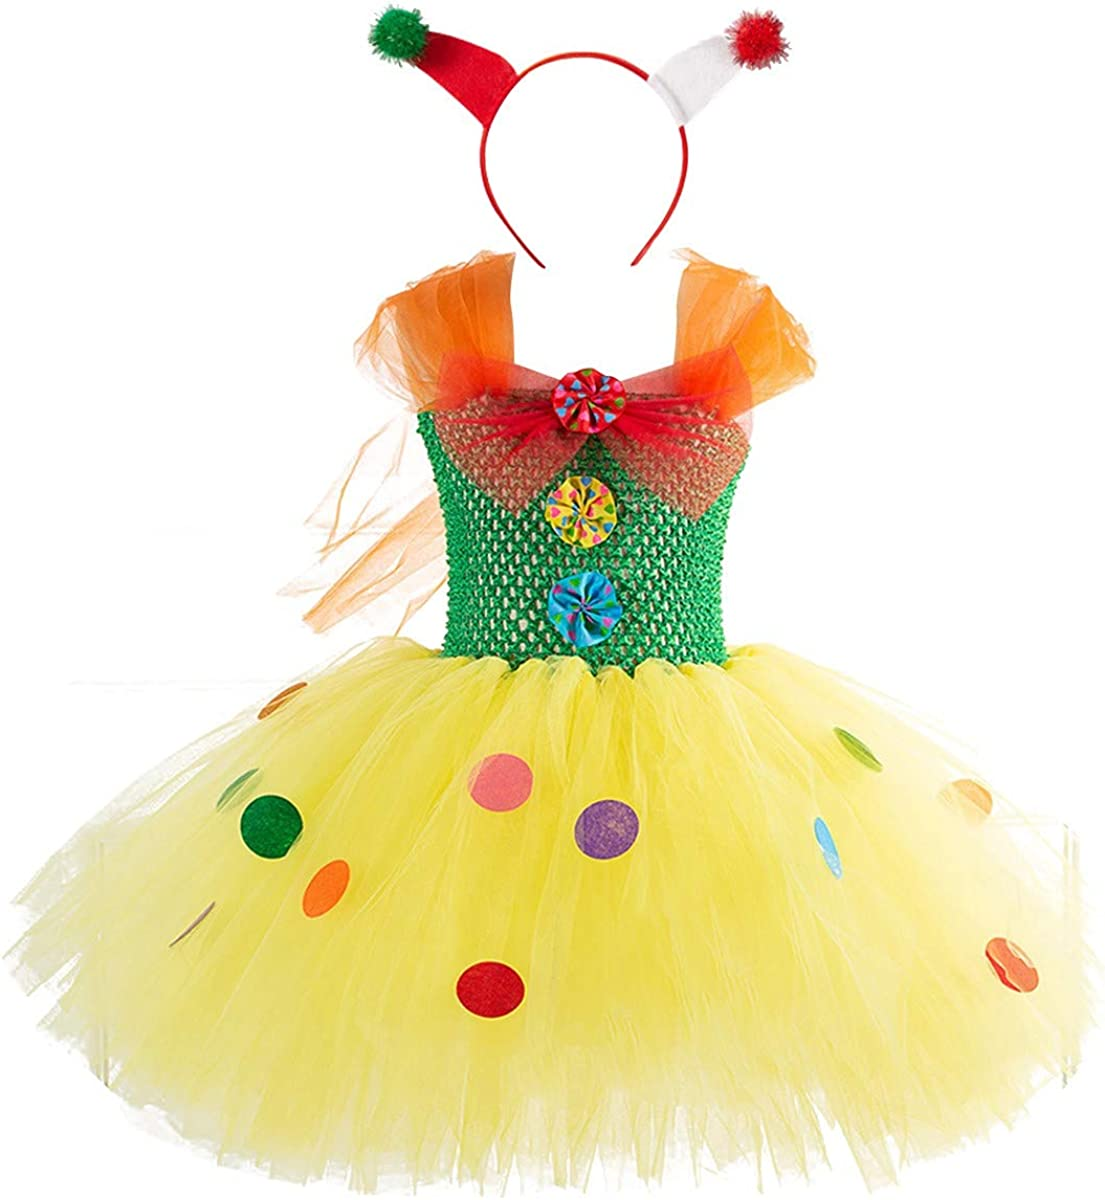 Toddler Girls Halloween Costume Age 2-3 Witch Cat Princess Tutu Fancy Dress Kids